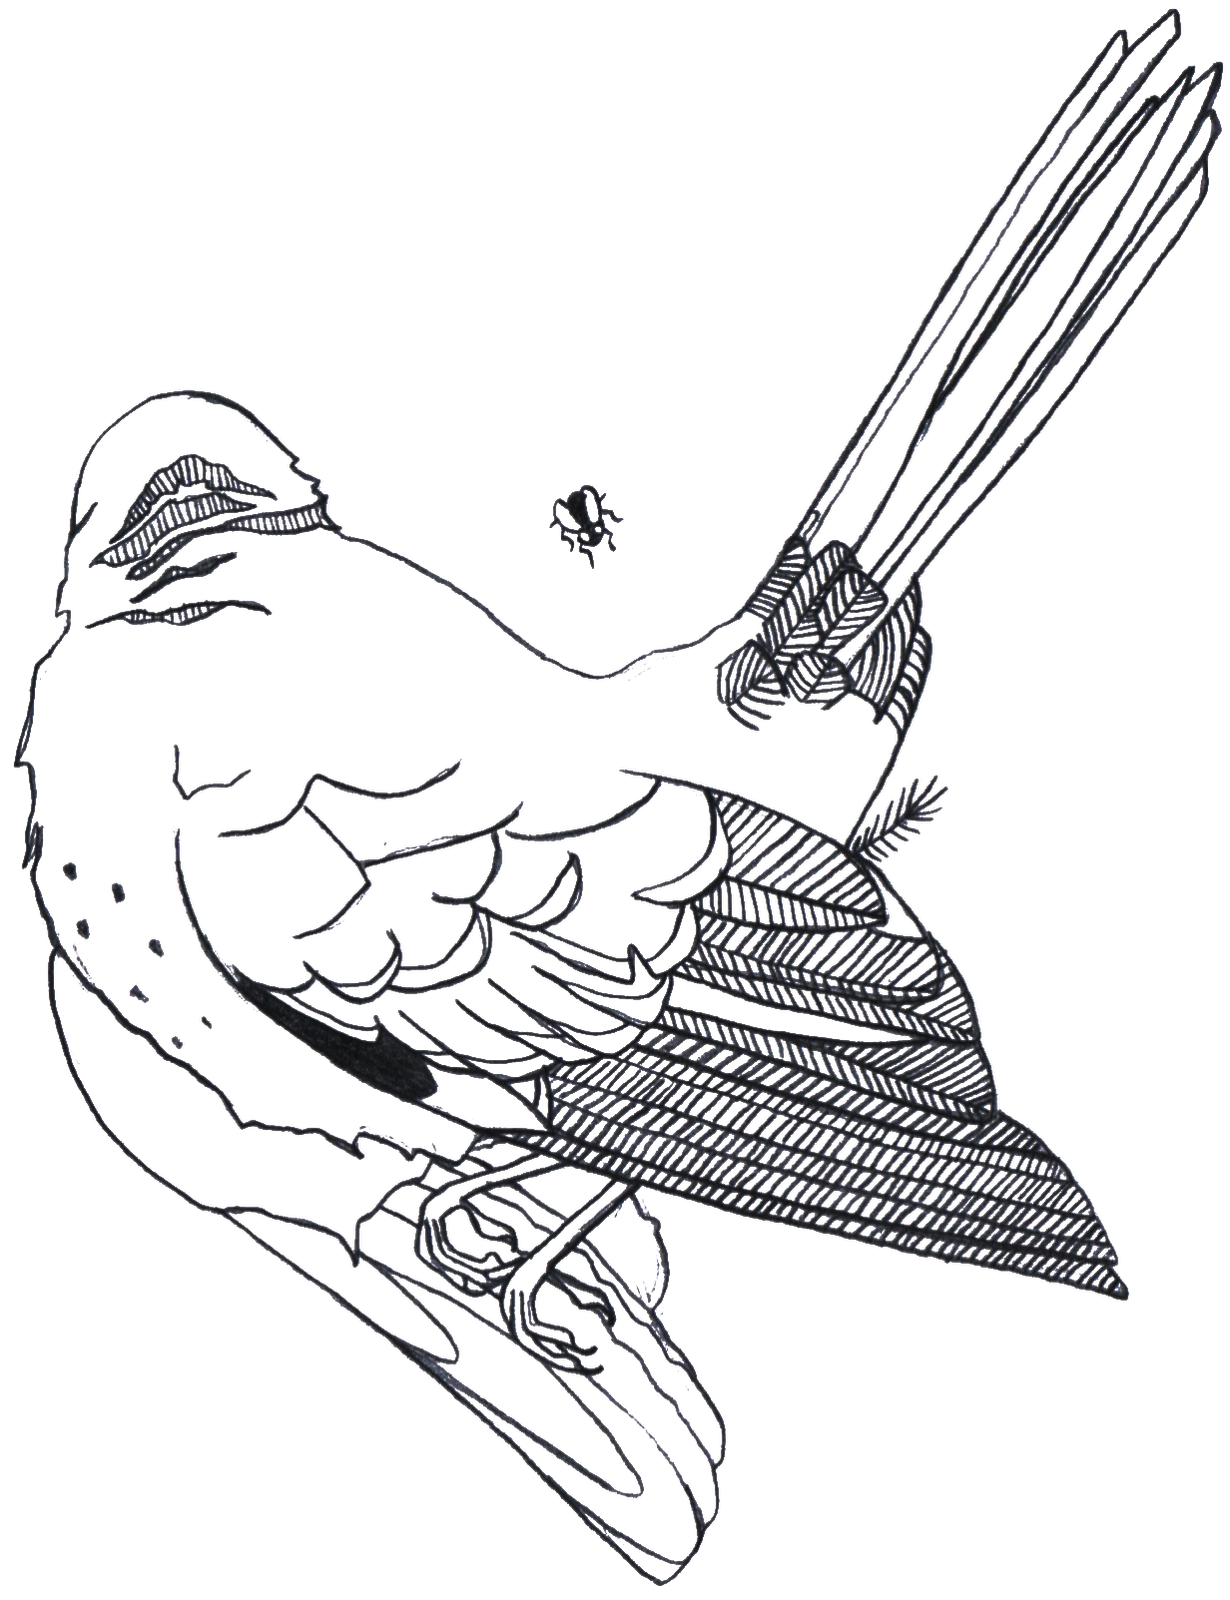 1230x1600 Lindsay Pulver Designs Dead Birds And A Coyote Series